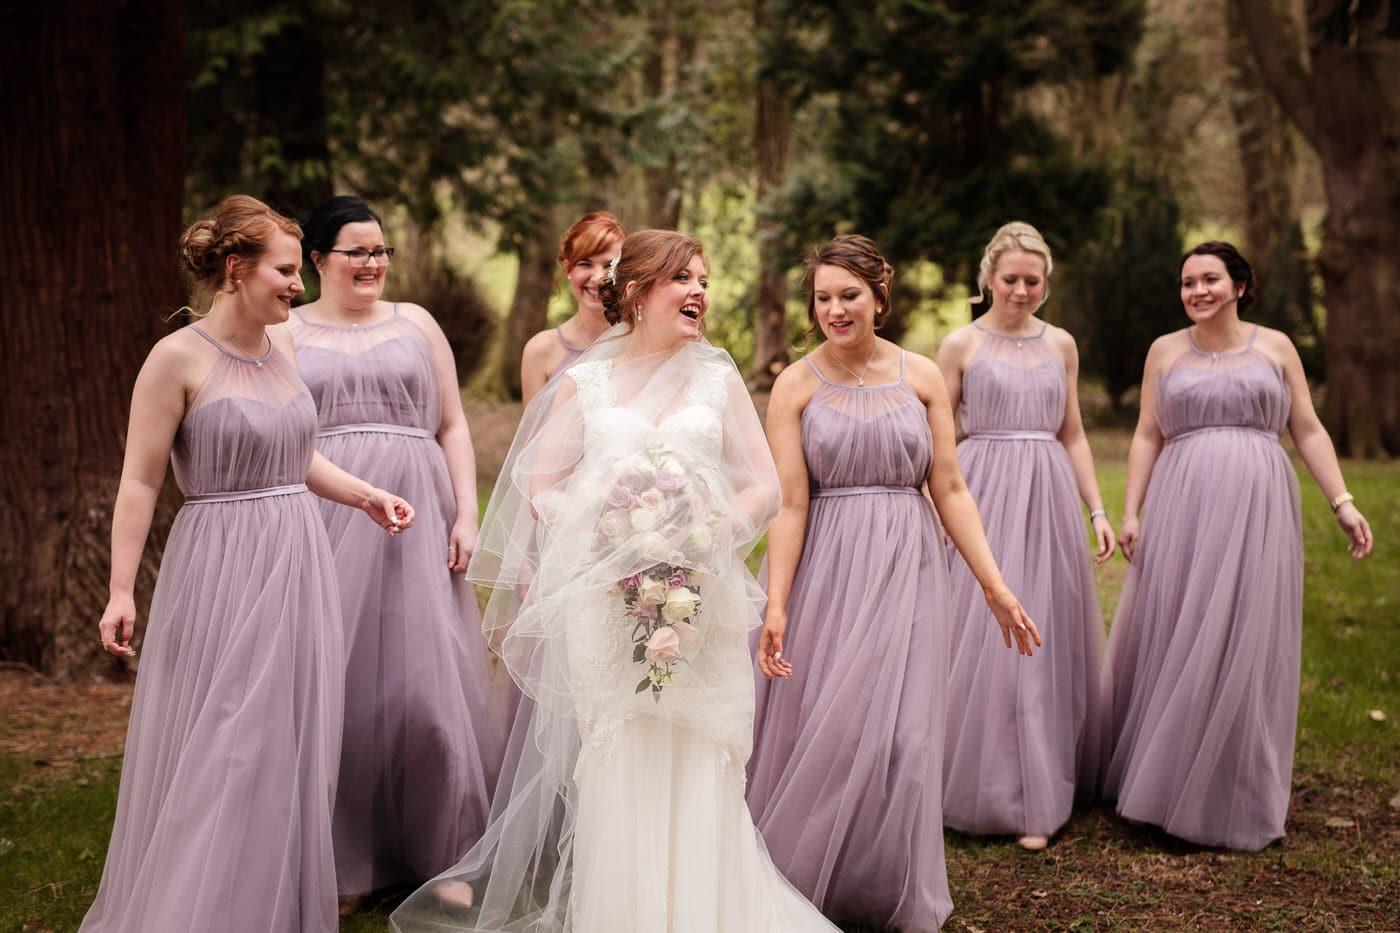 Bridesmaids in attendance at a Tyn Dwr Hall Wedding